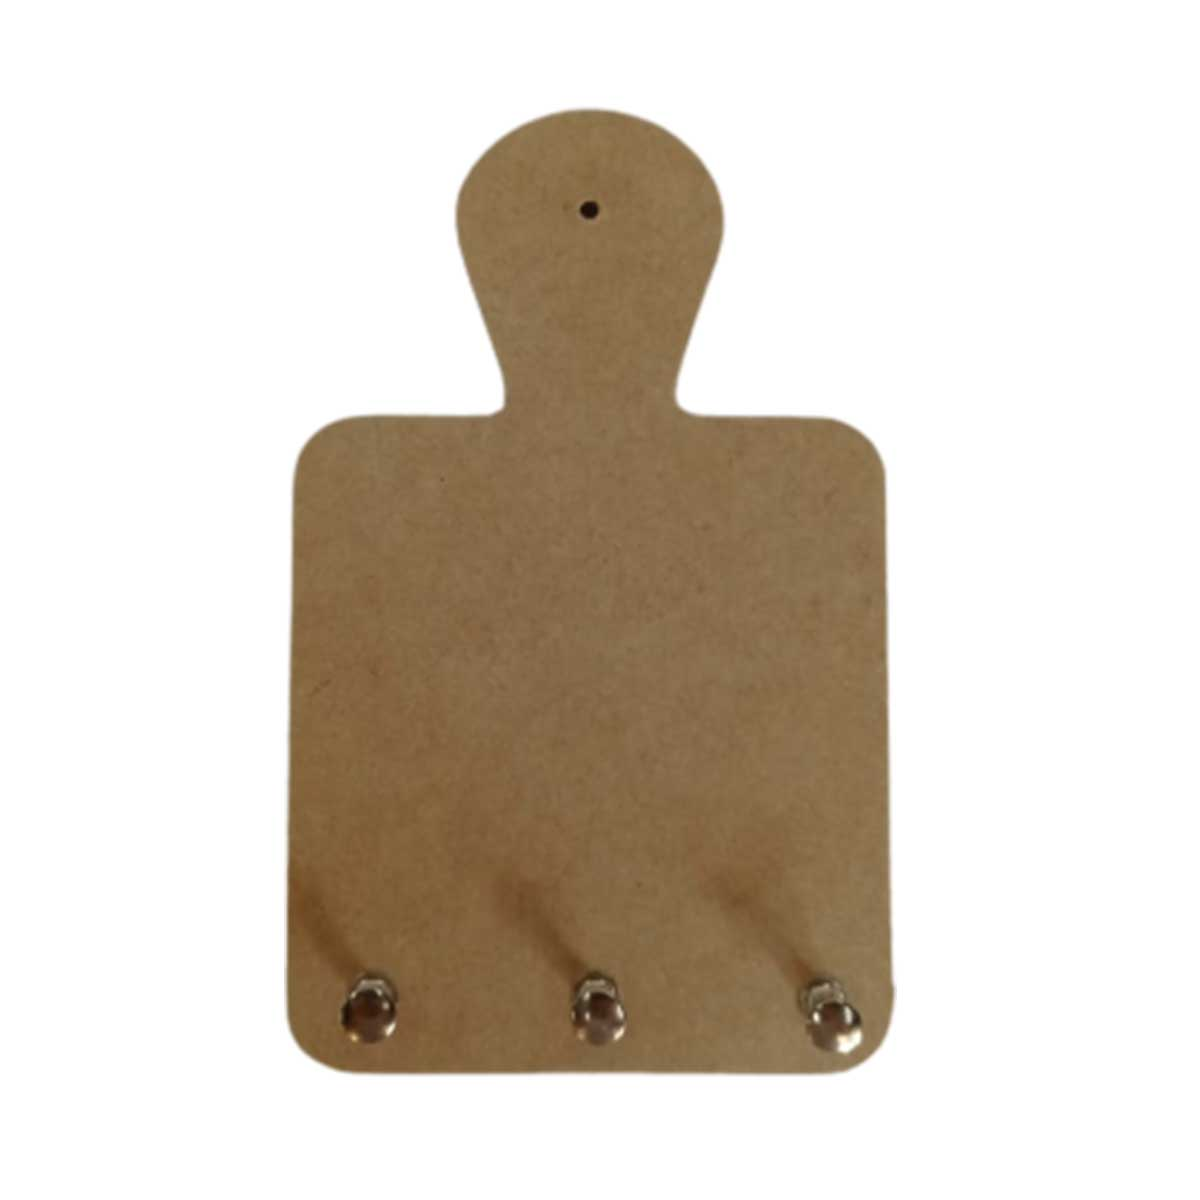 Porta Chaves em MDF - Tábua de Carne 11,5x18,5x3cm